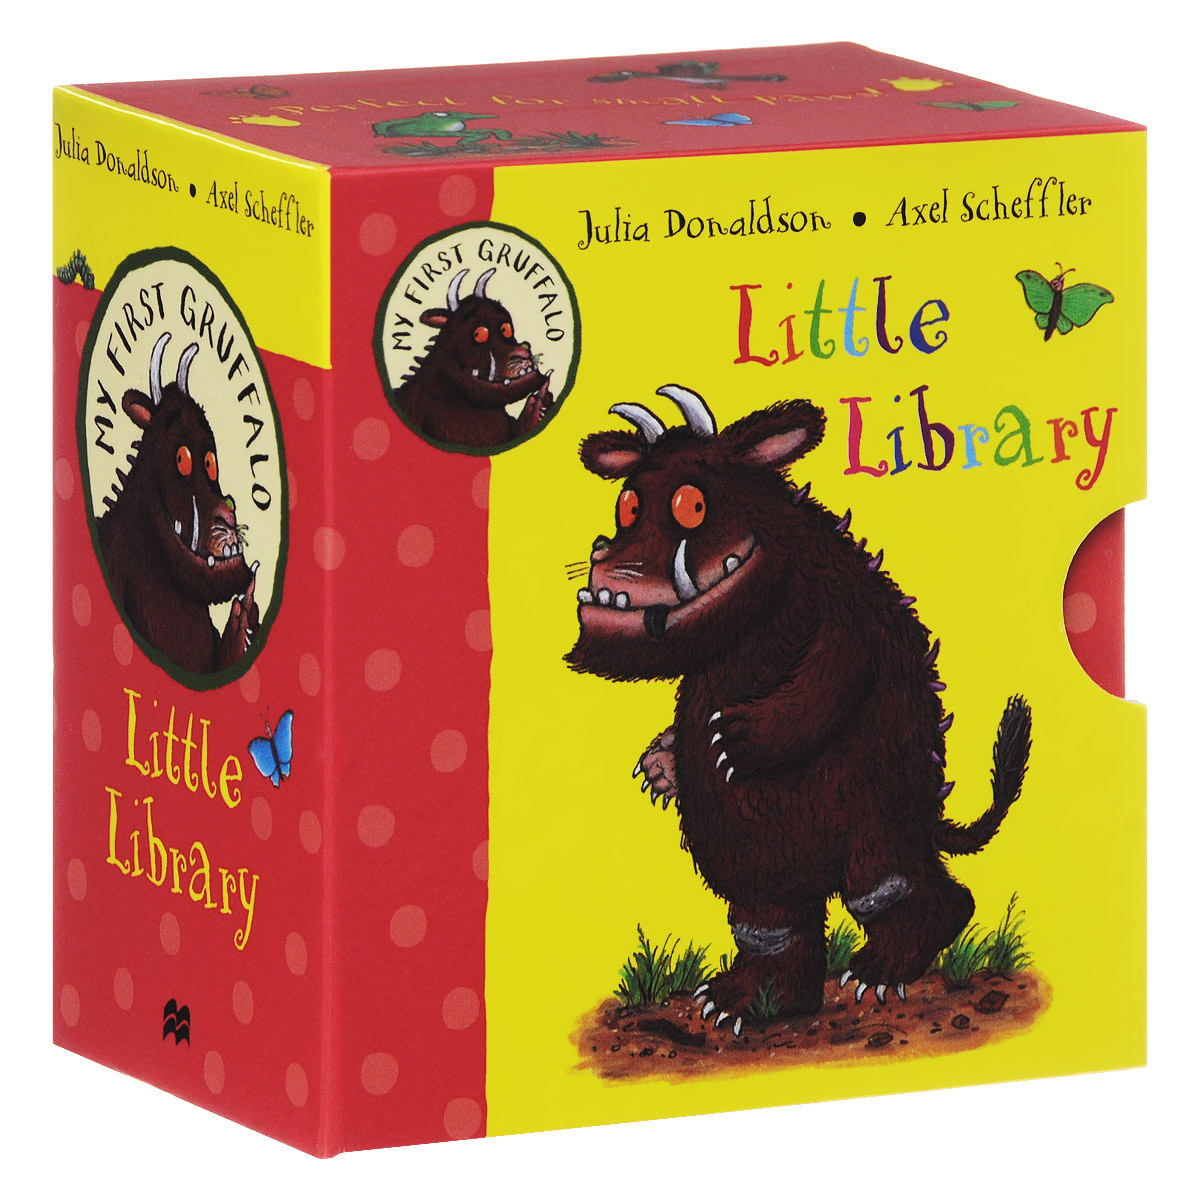 My First Gruffalo Little Library (комплект из 4 миниатюрных книжек) little library 6 books